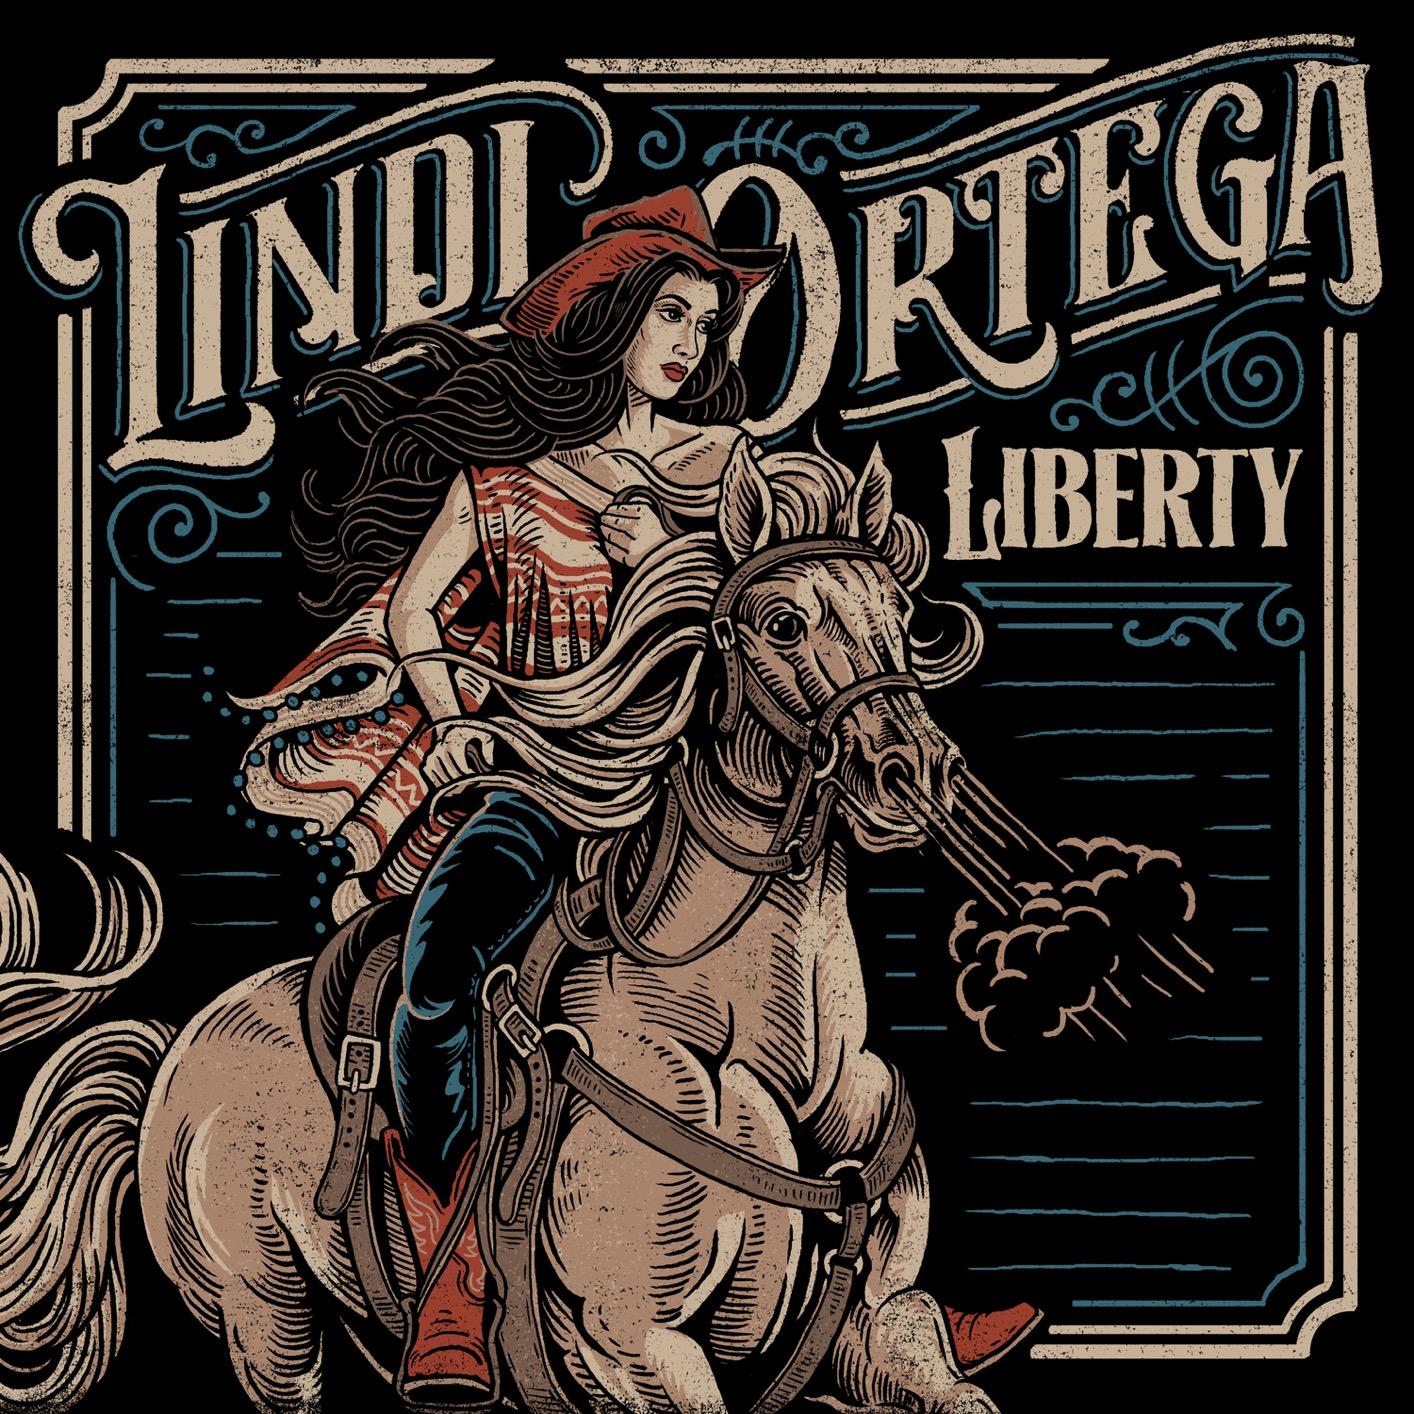 Lindi Ortega - Liberty (2018) [Official Digital Download]